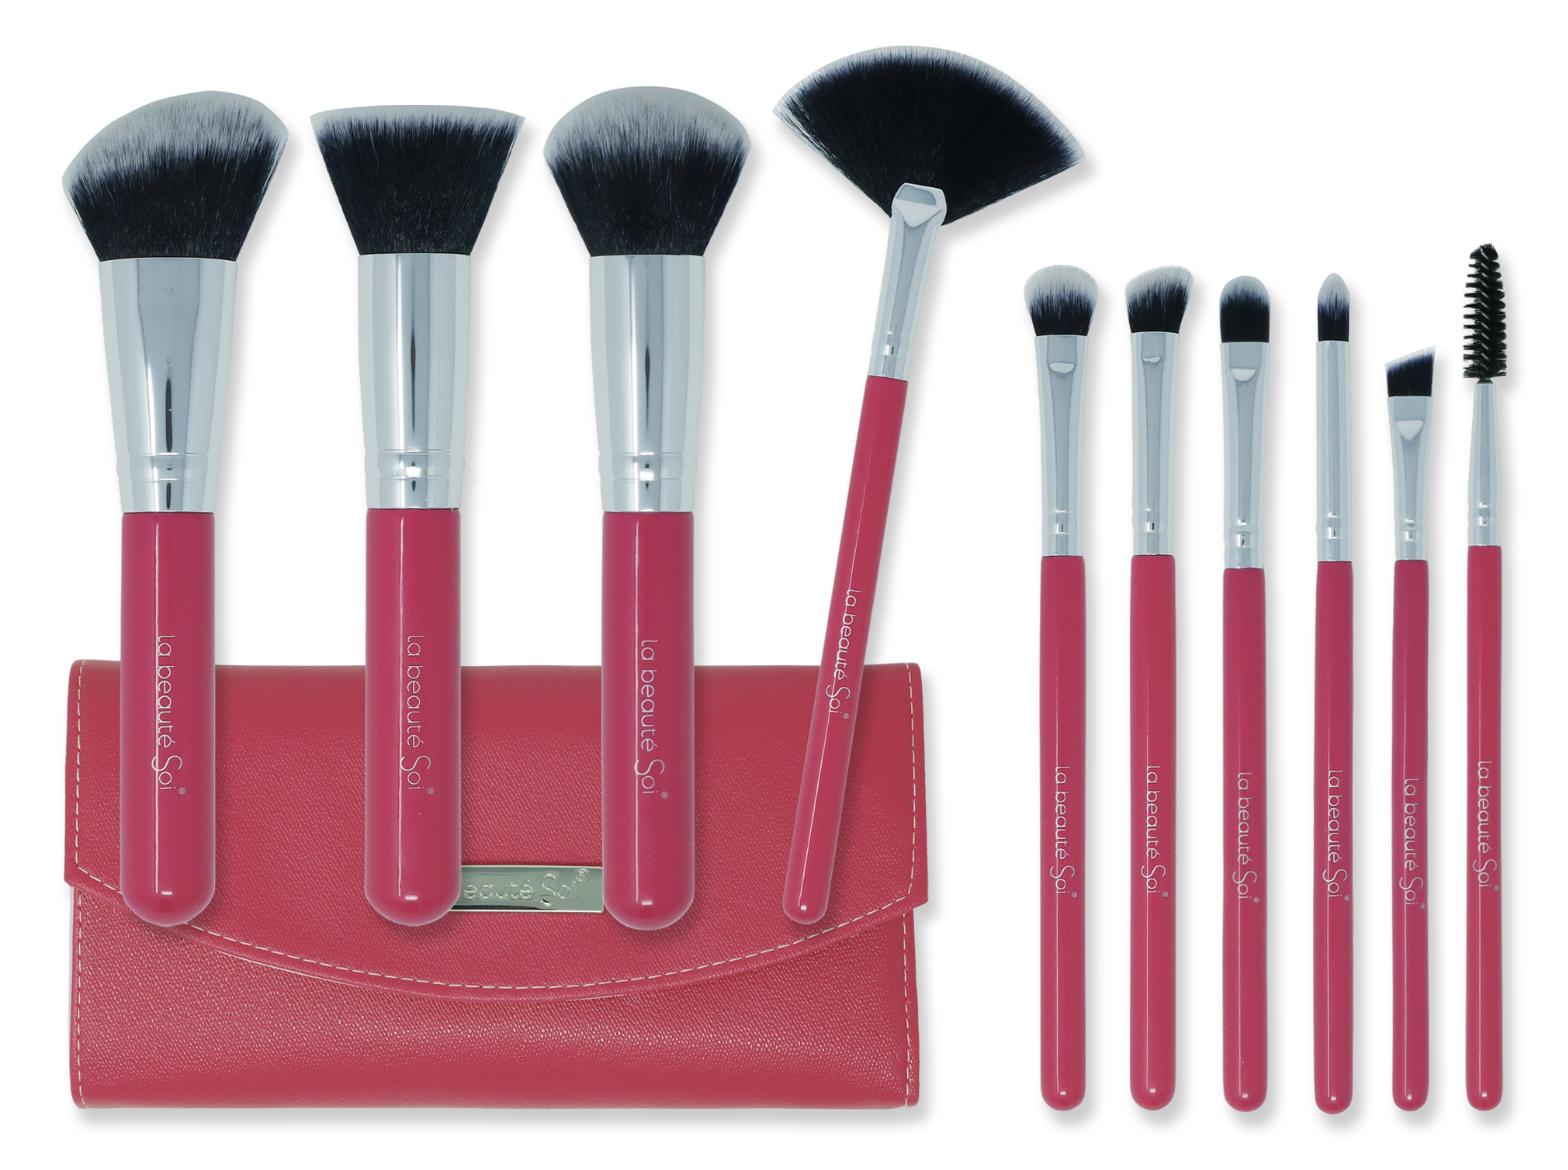 La Beaute Soi makeup brushes